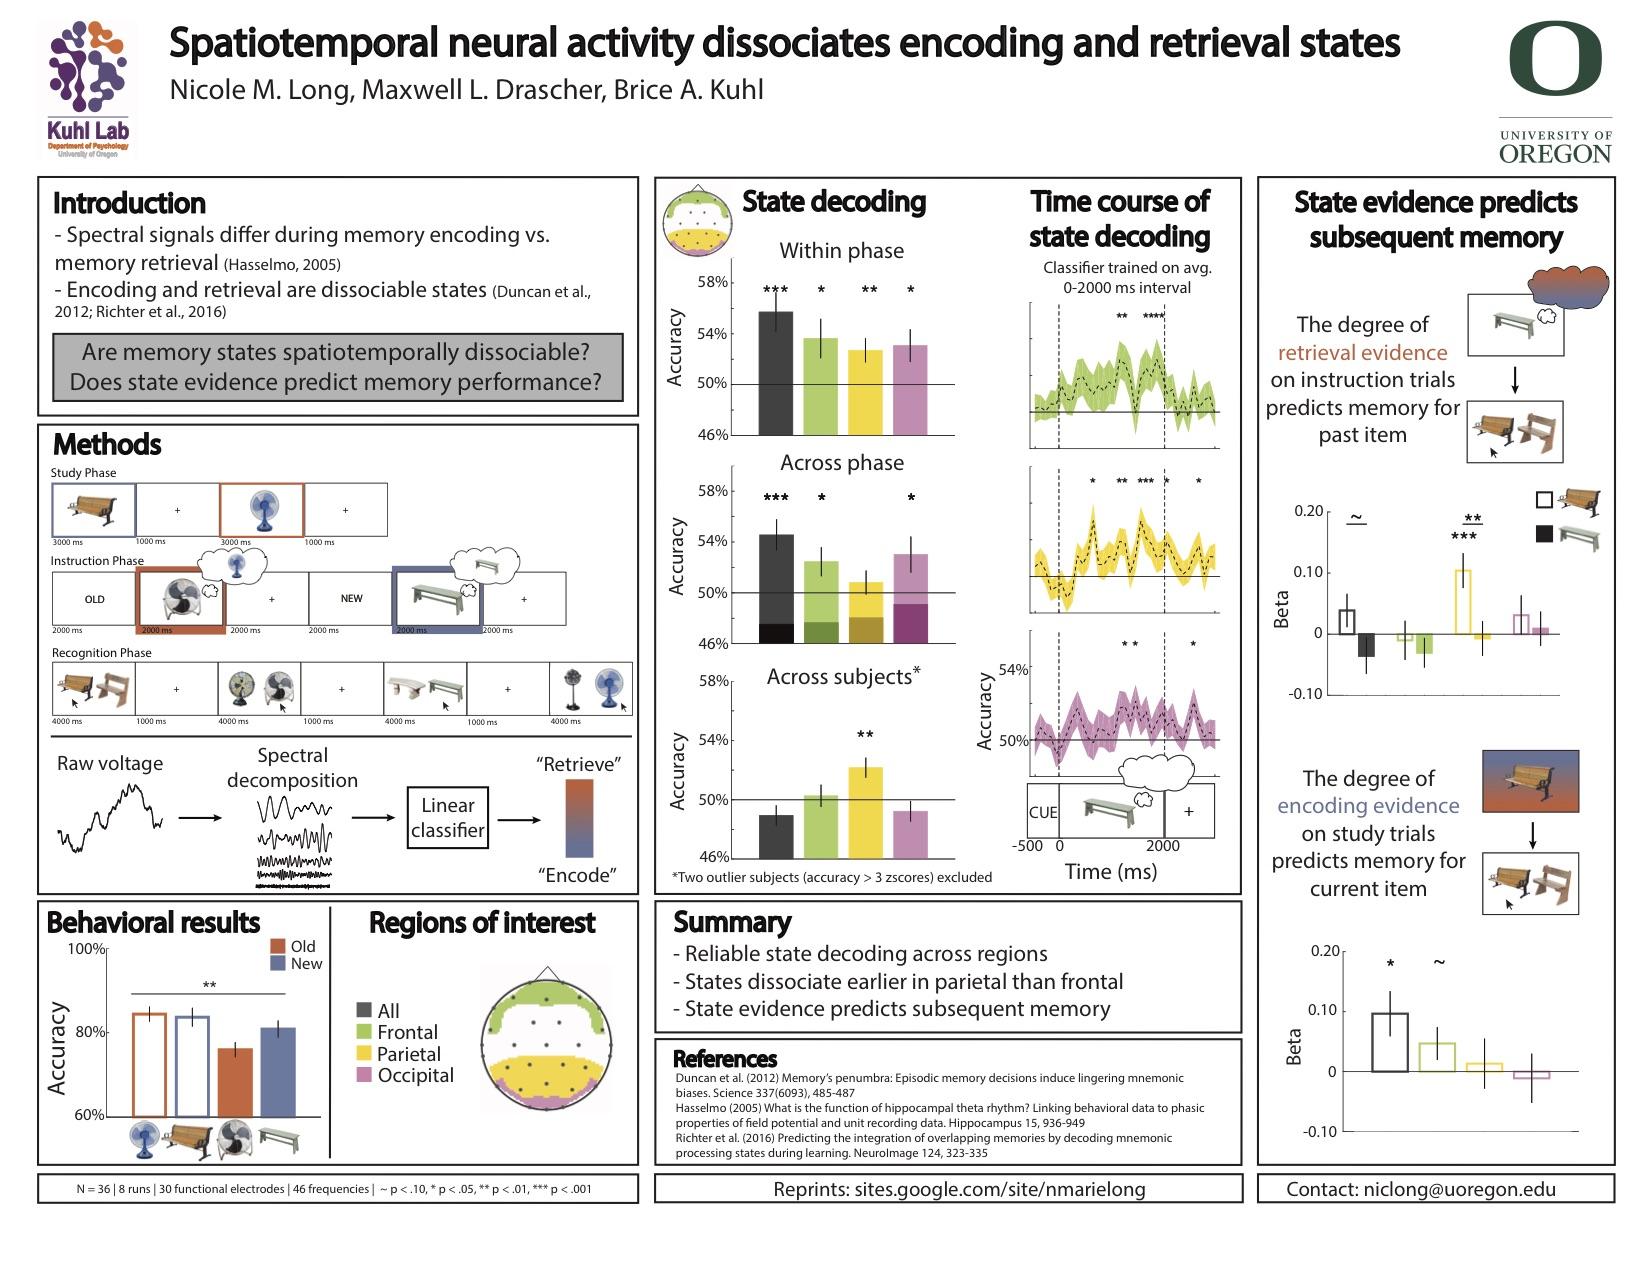 Spatiotemporal neural activity dissociates encoding and retrieval states